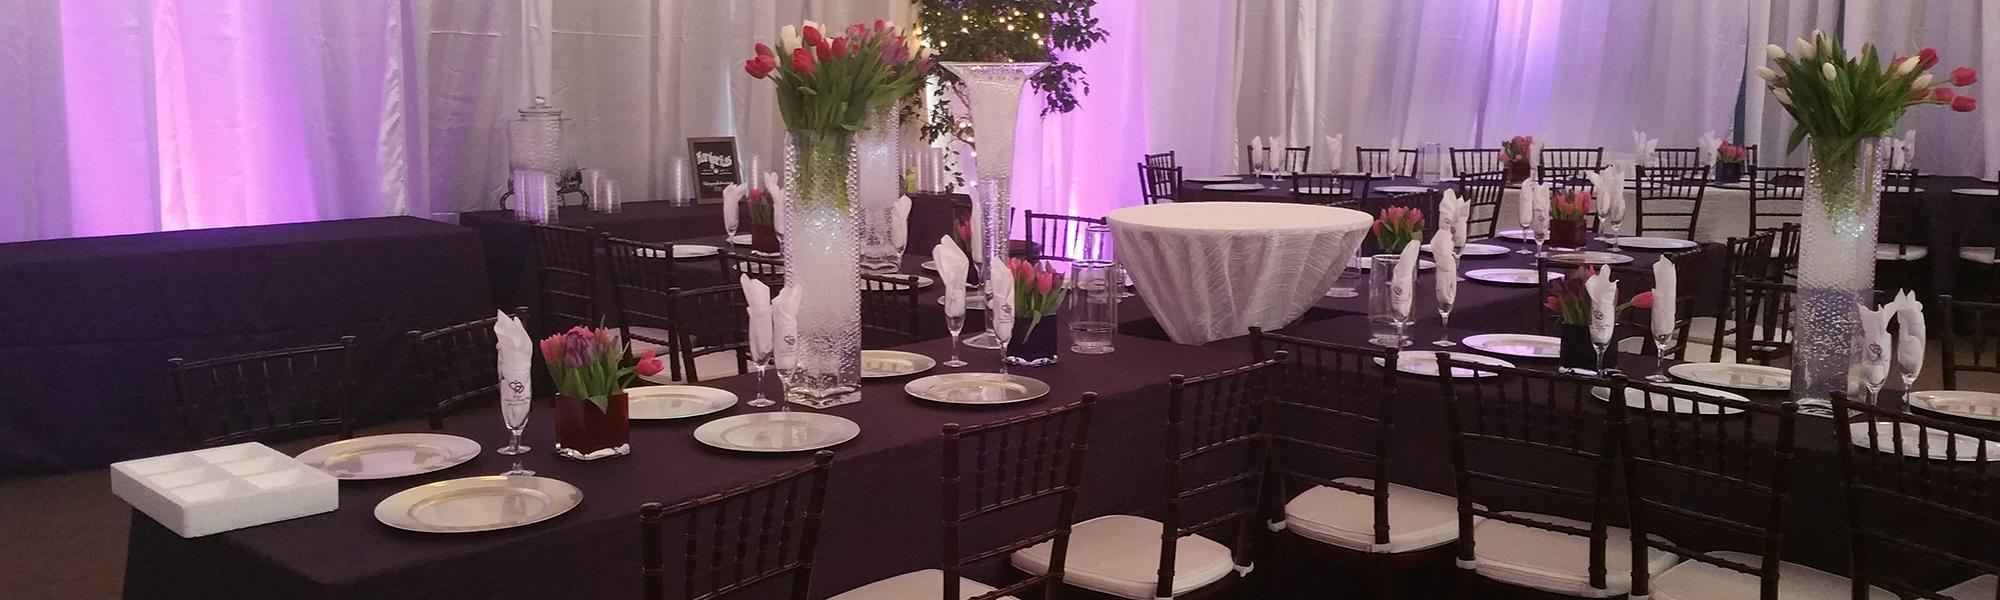 premierpartyonline wedding rental PreviousNext